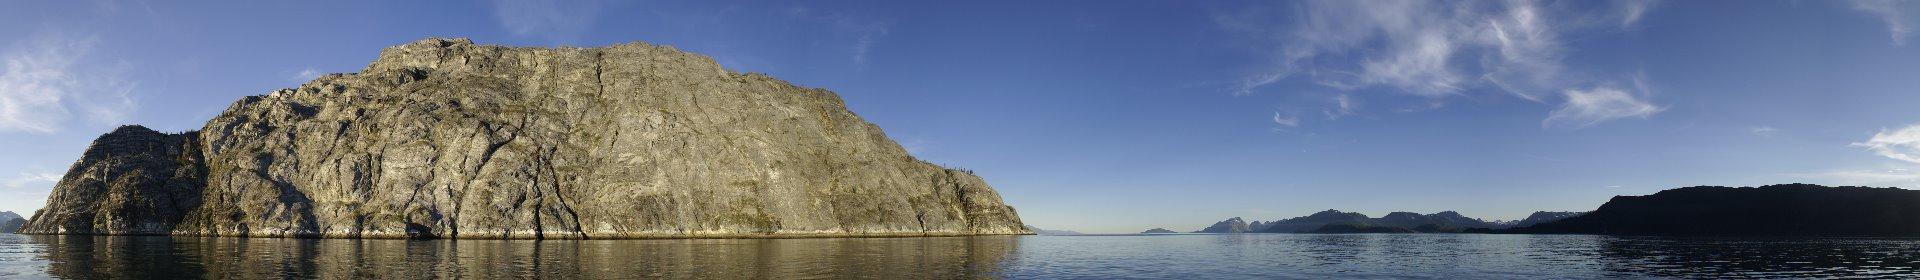 Gloomy Knob, Glacier Bay and the Gilbert Peninsula